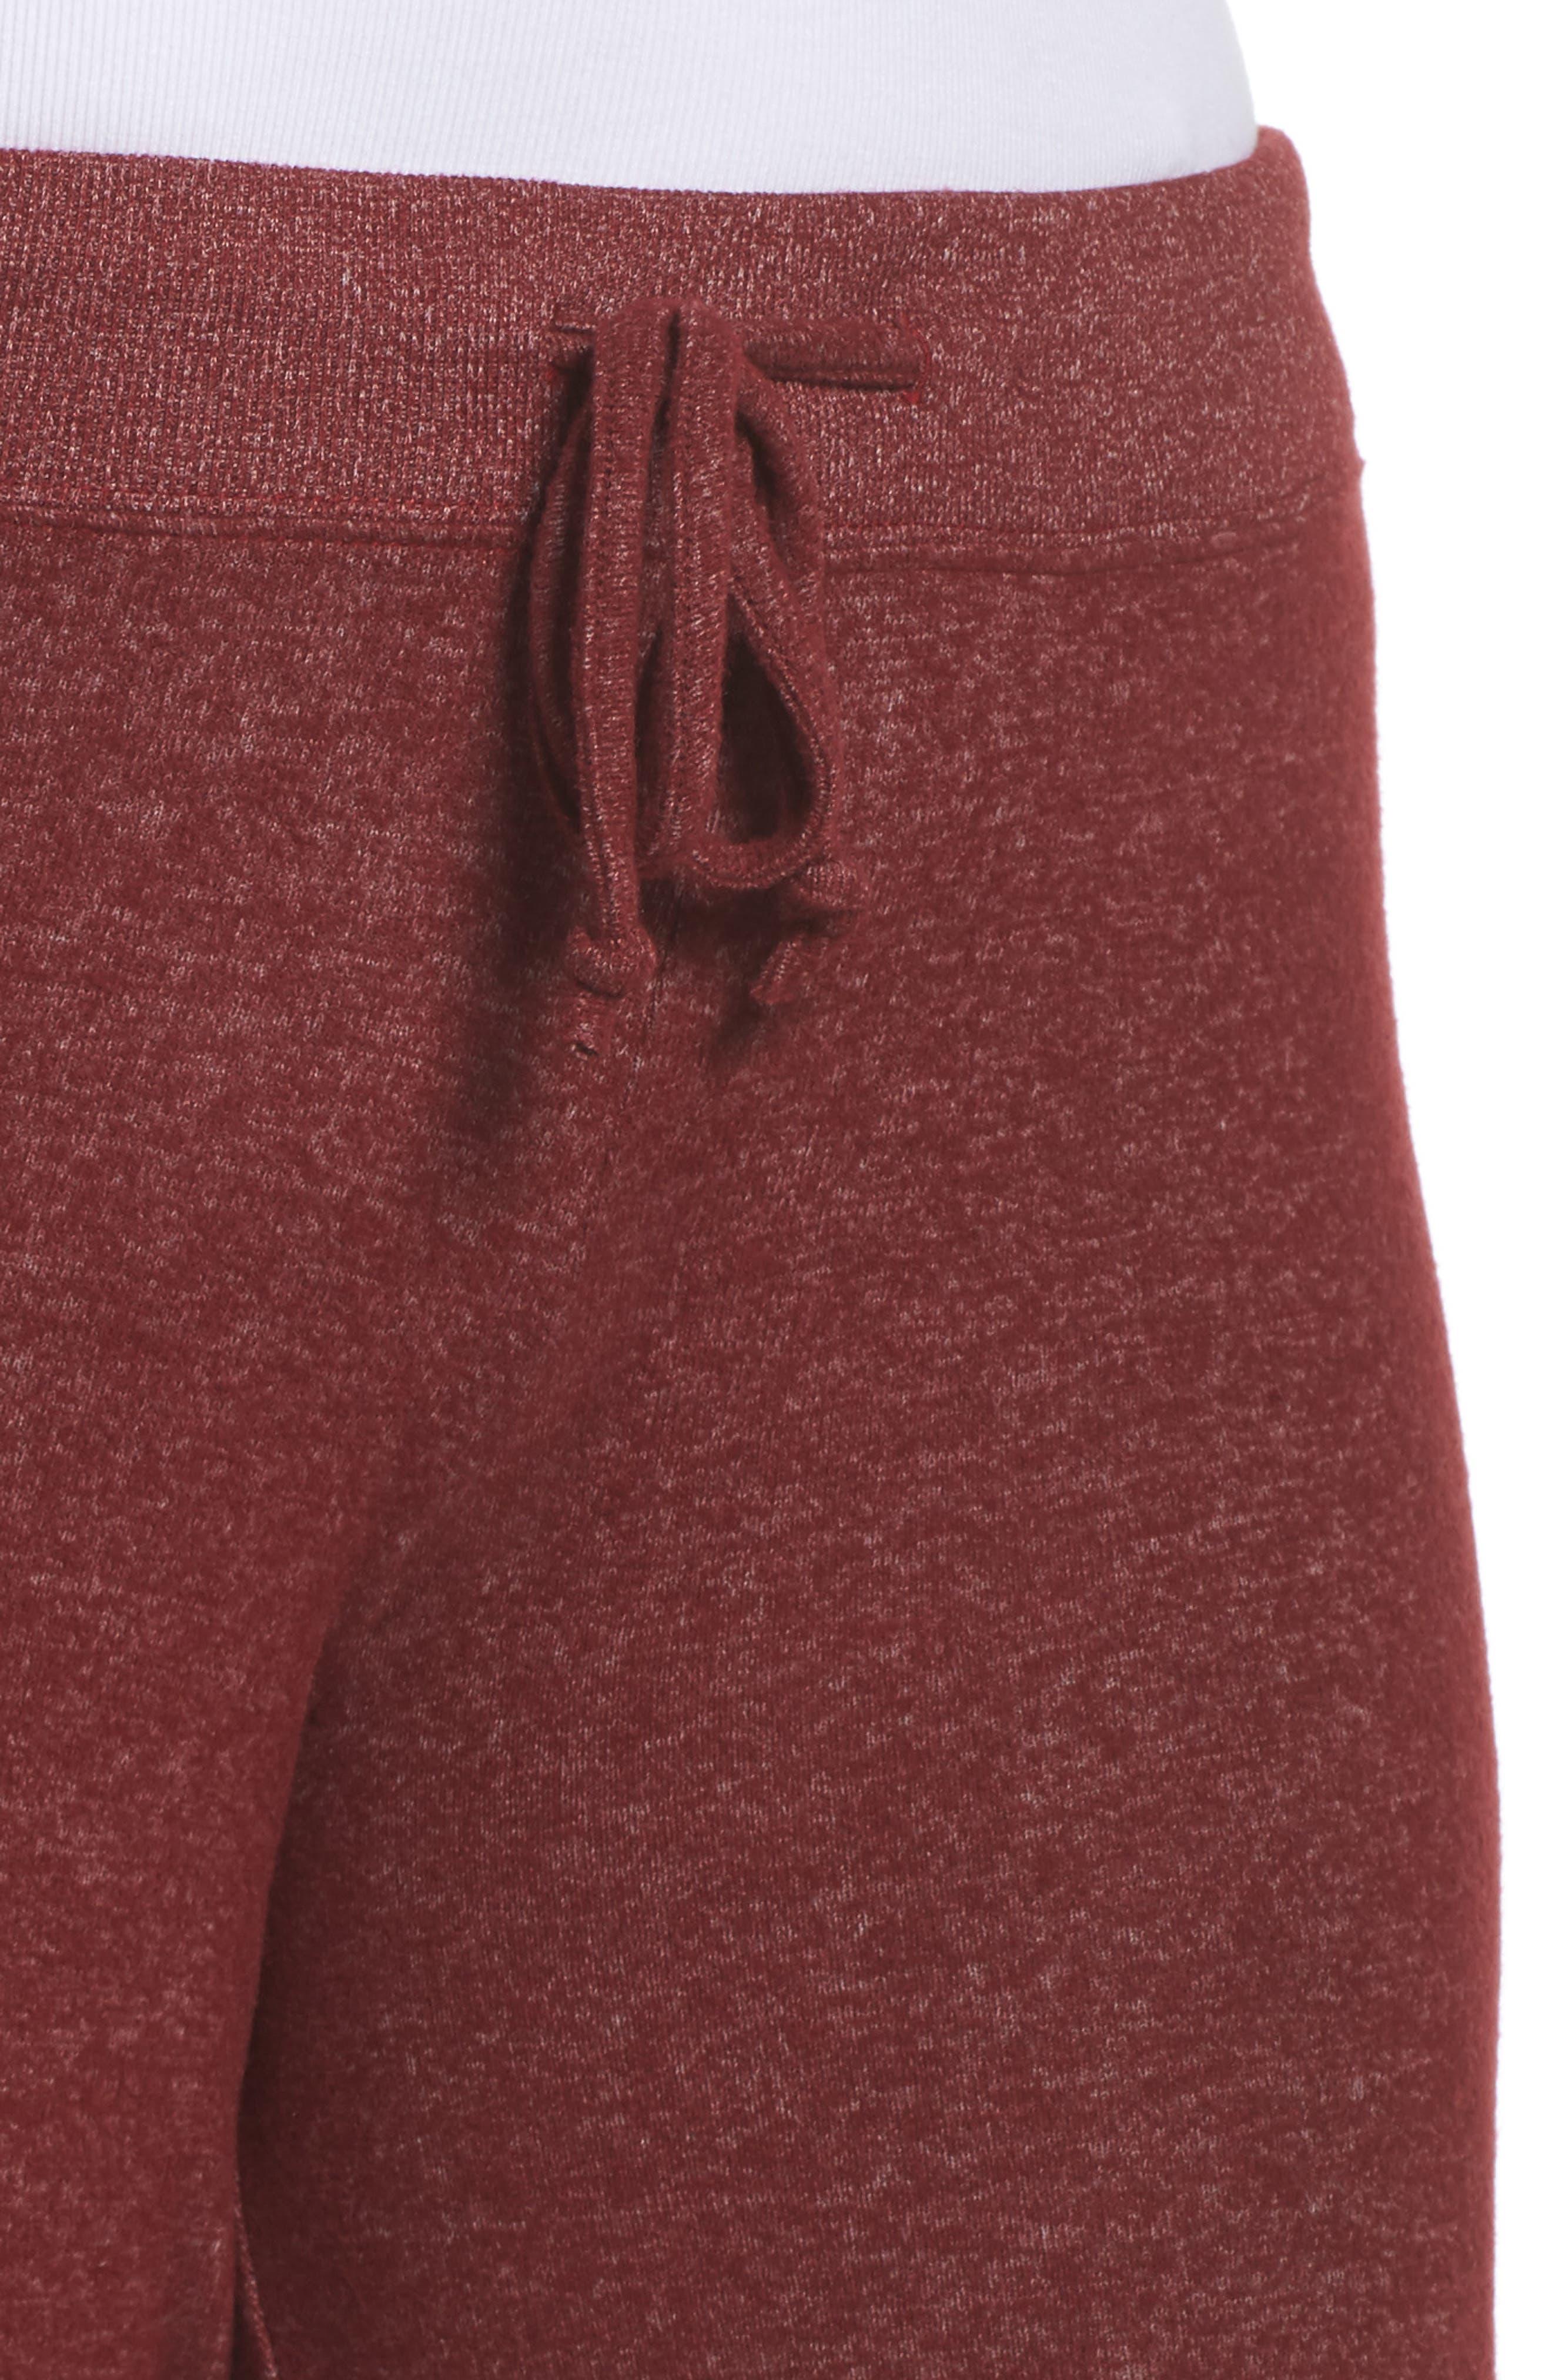 'Best Boyfriend' Brushed Hacci Lounge Pants,                             Alternate thumbnail 5, color,                             Red Grape